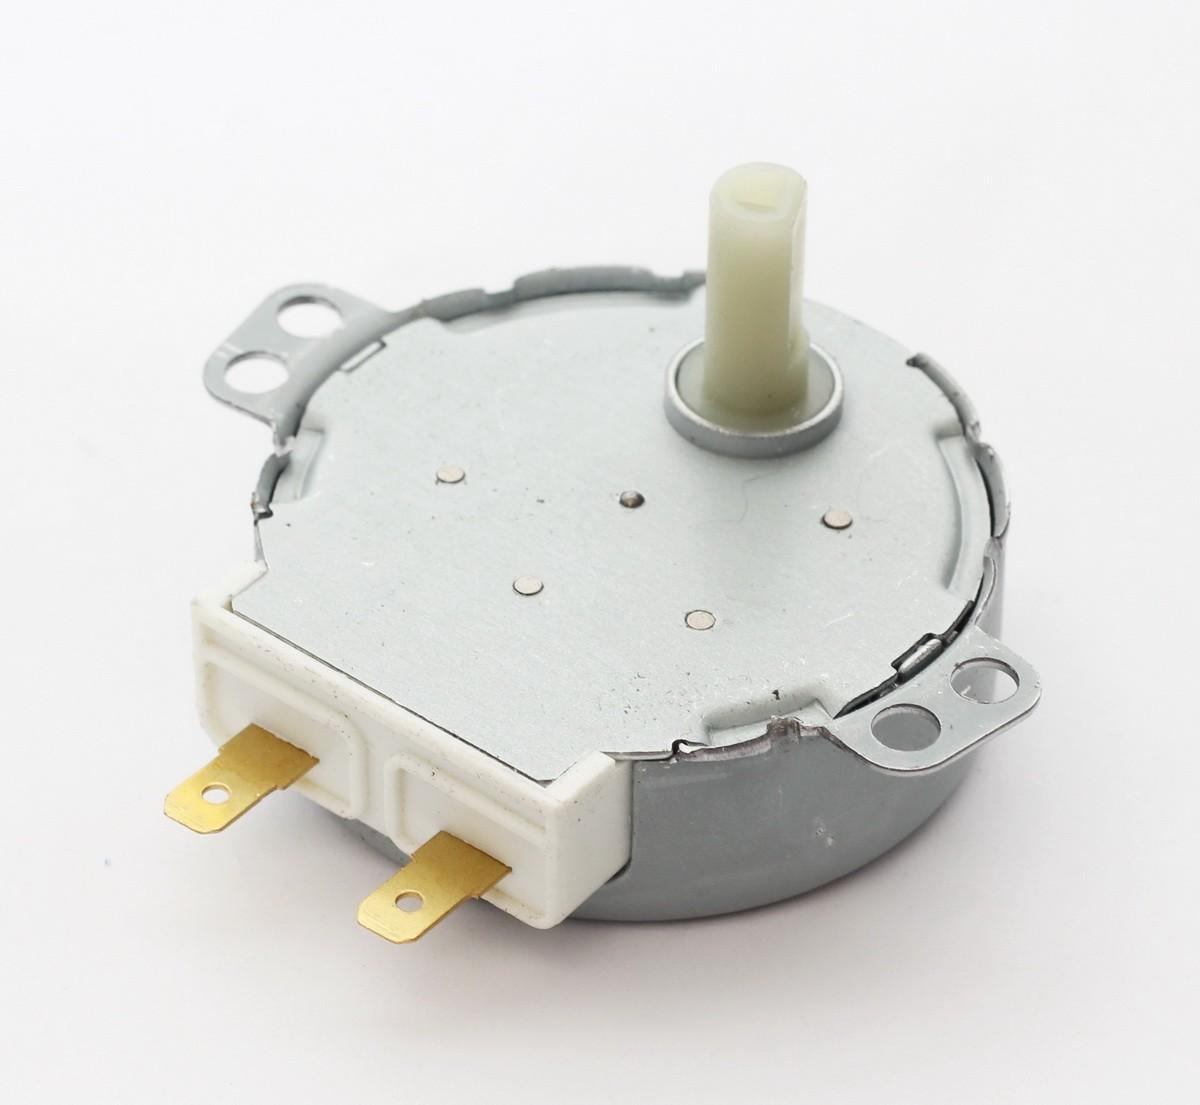 Black Mi2 /& Mi7 Dualit Timer Control Knob Universal Fitting for all Dualits